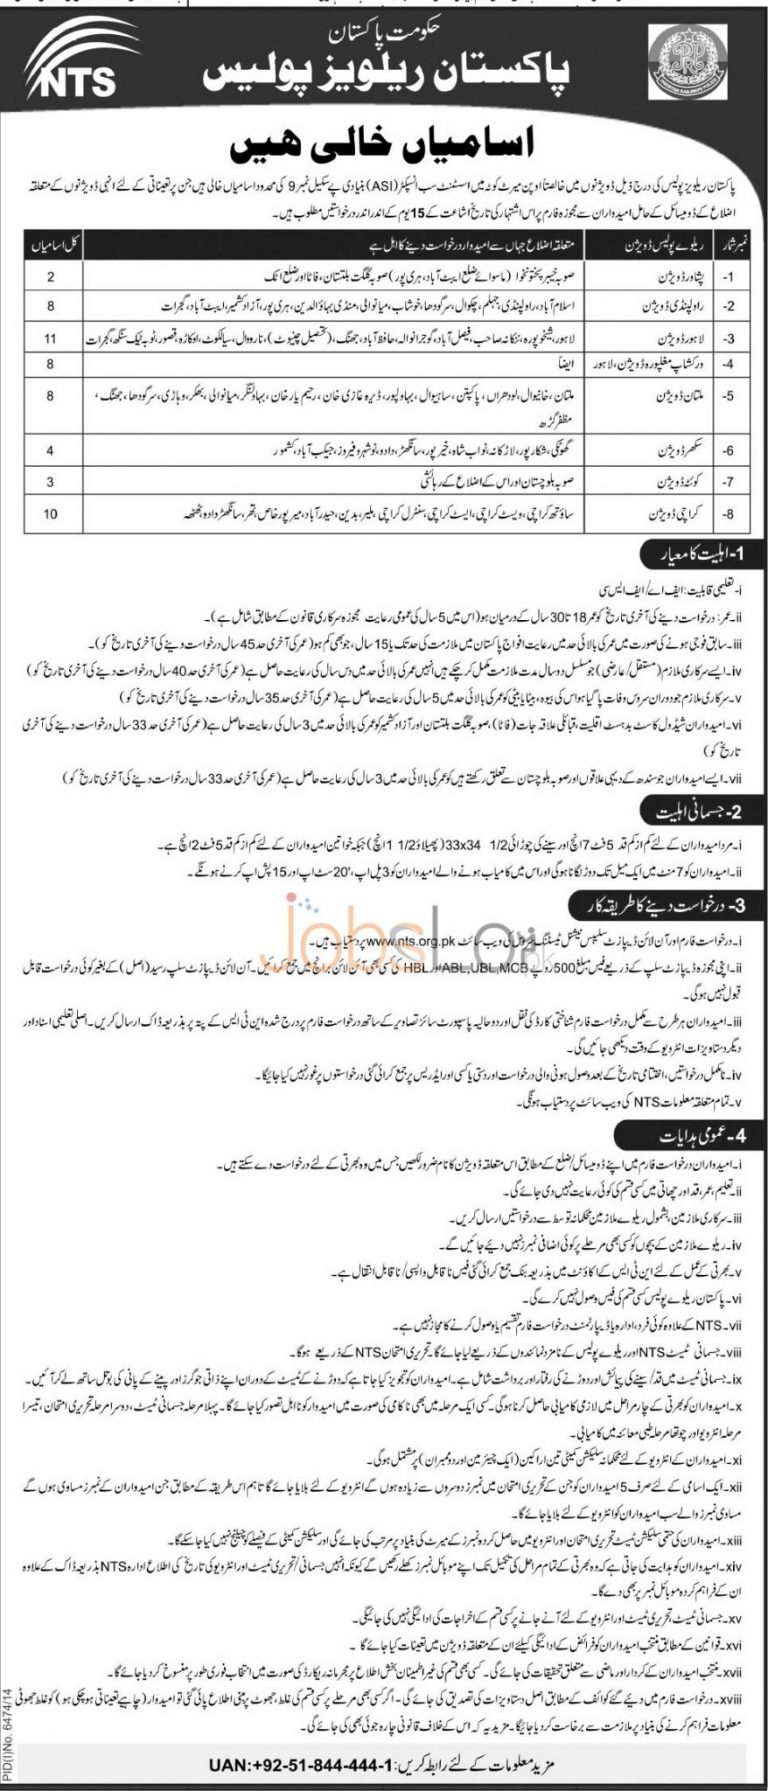 NTS Pakistan Railways ASI Jobs 2015 Lahore, Peshawar, Karachi, Multan, Rawalpindi